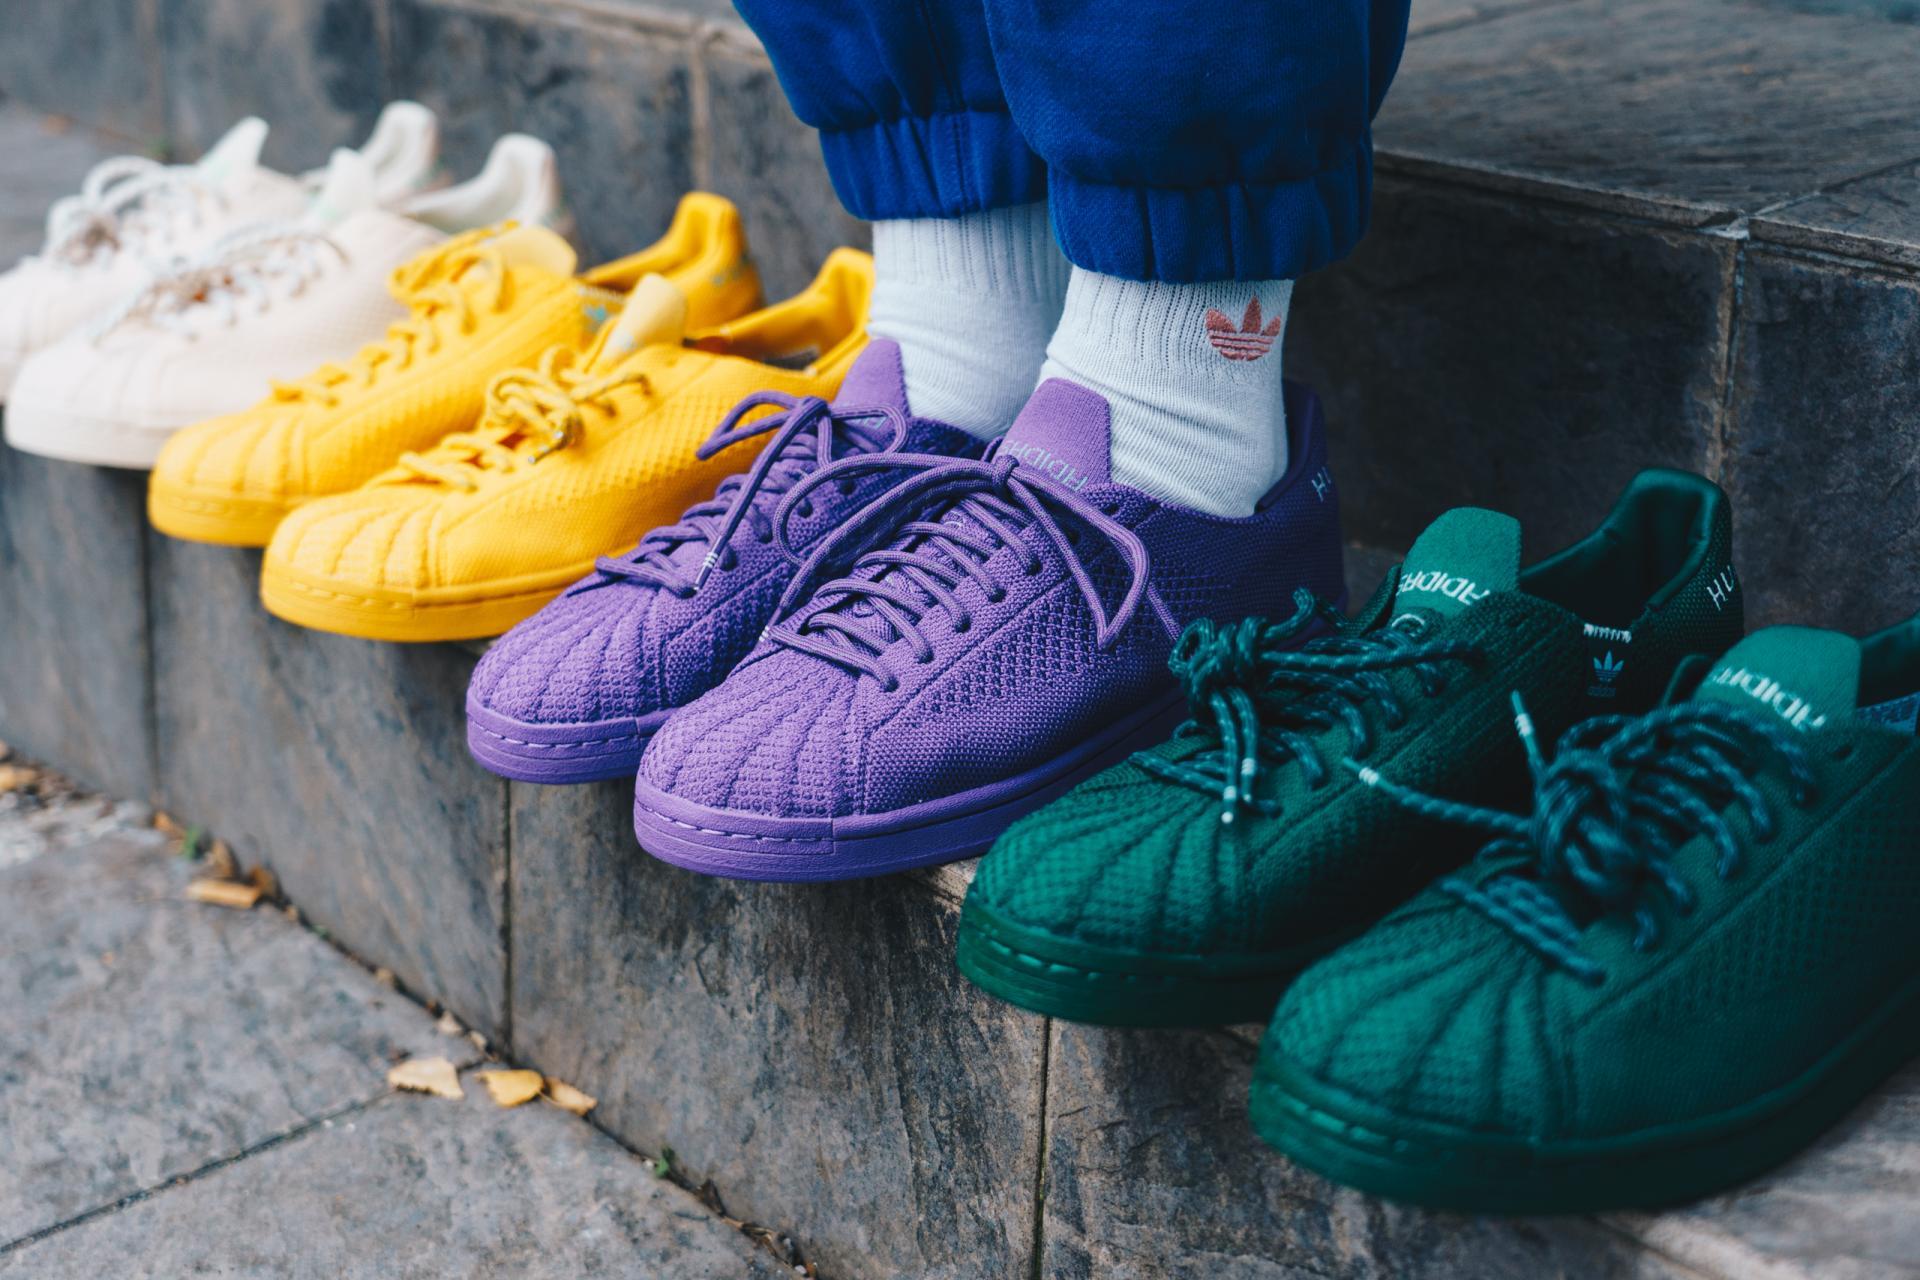 The adidas Originals x Pharrell Williams' collaboration color ...